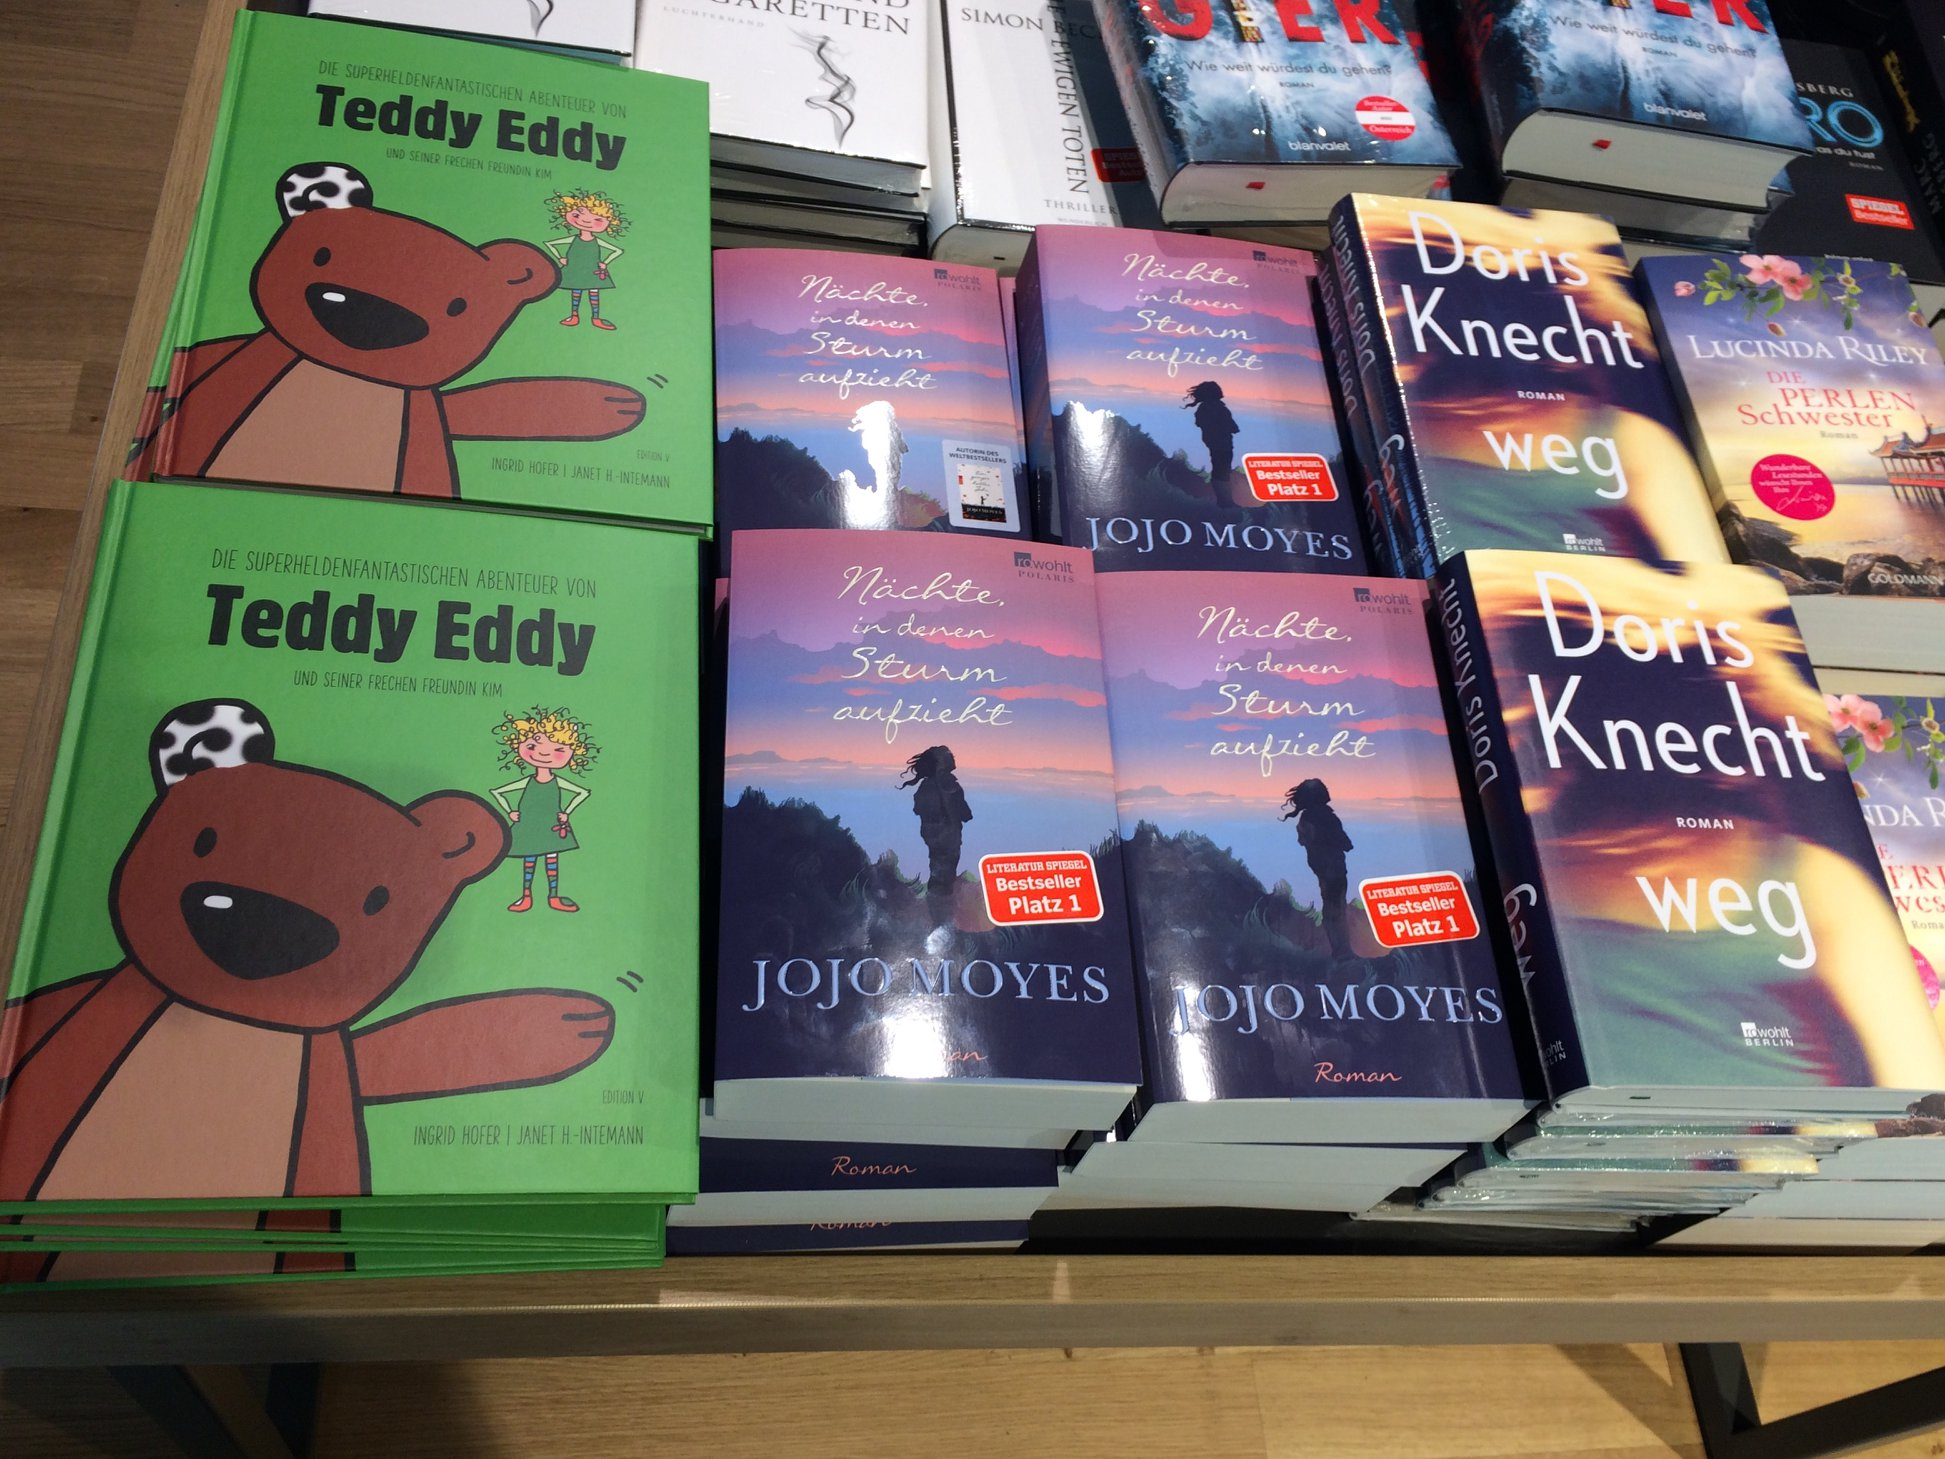 Fanpost Bestseller Teddy Eddy Ingrid Hofer